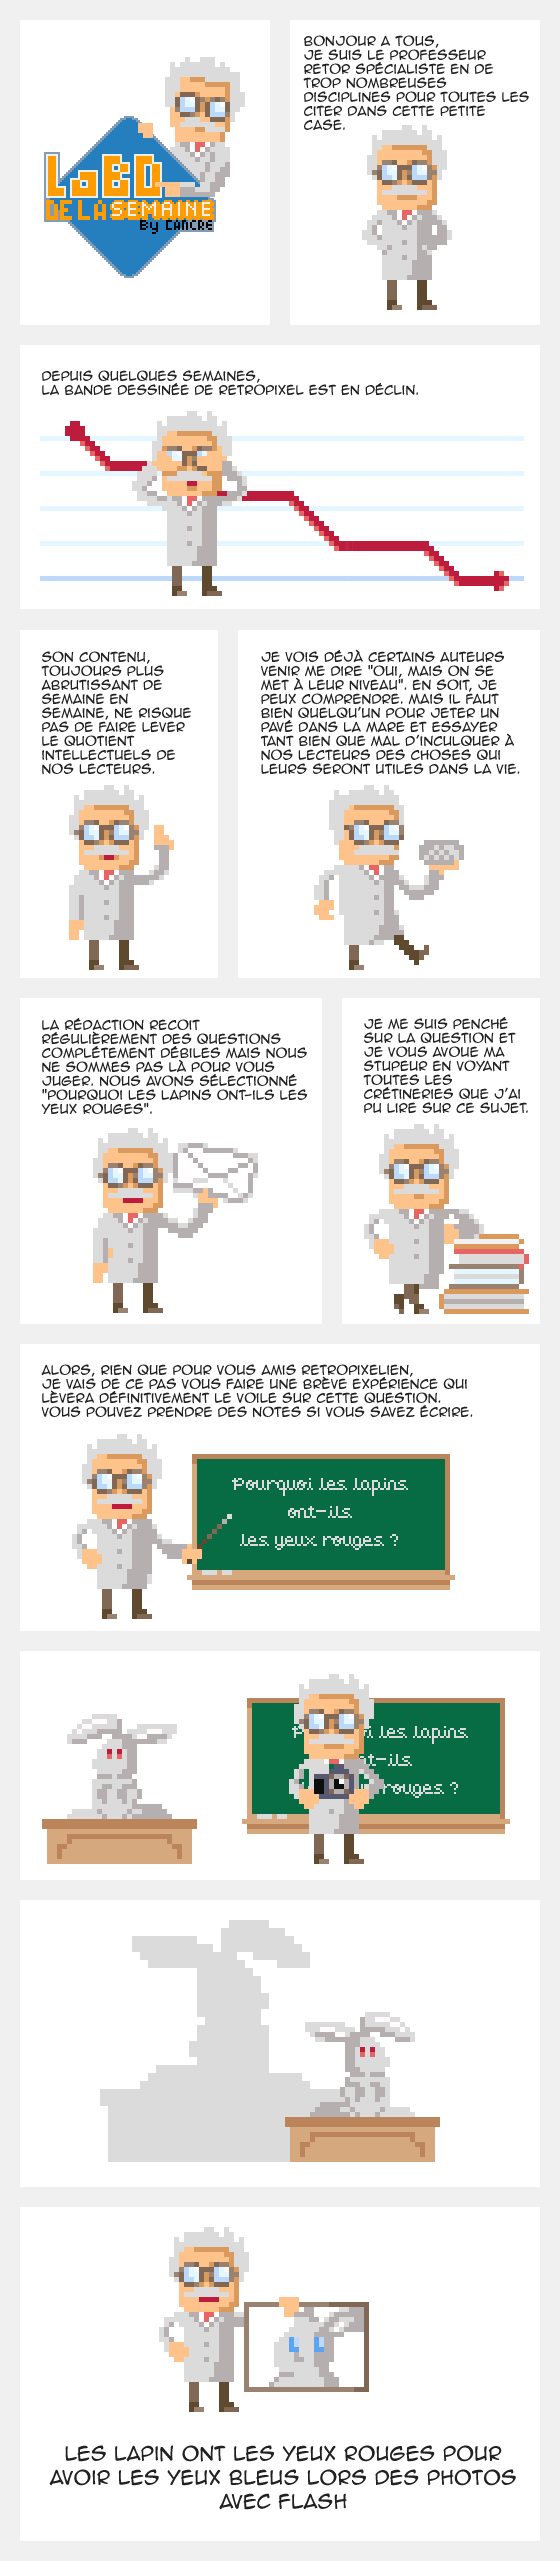 professeur_retor-1.png